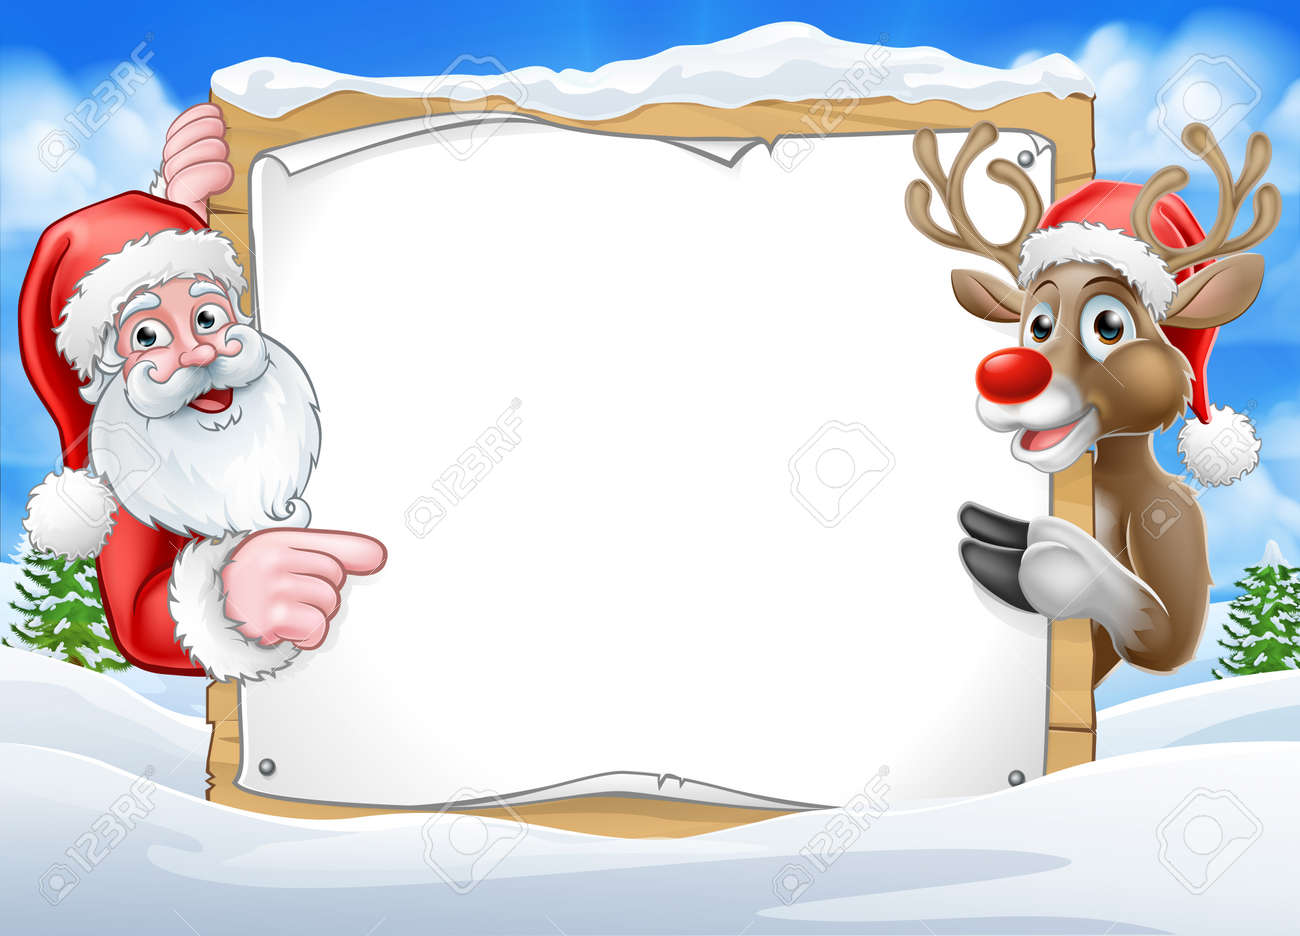 Christmas Sign Reindeer and Santa Background - 90768829